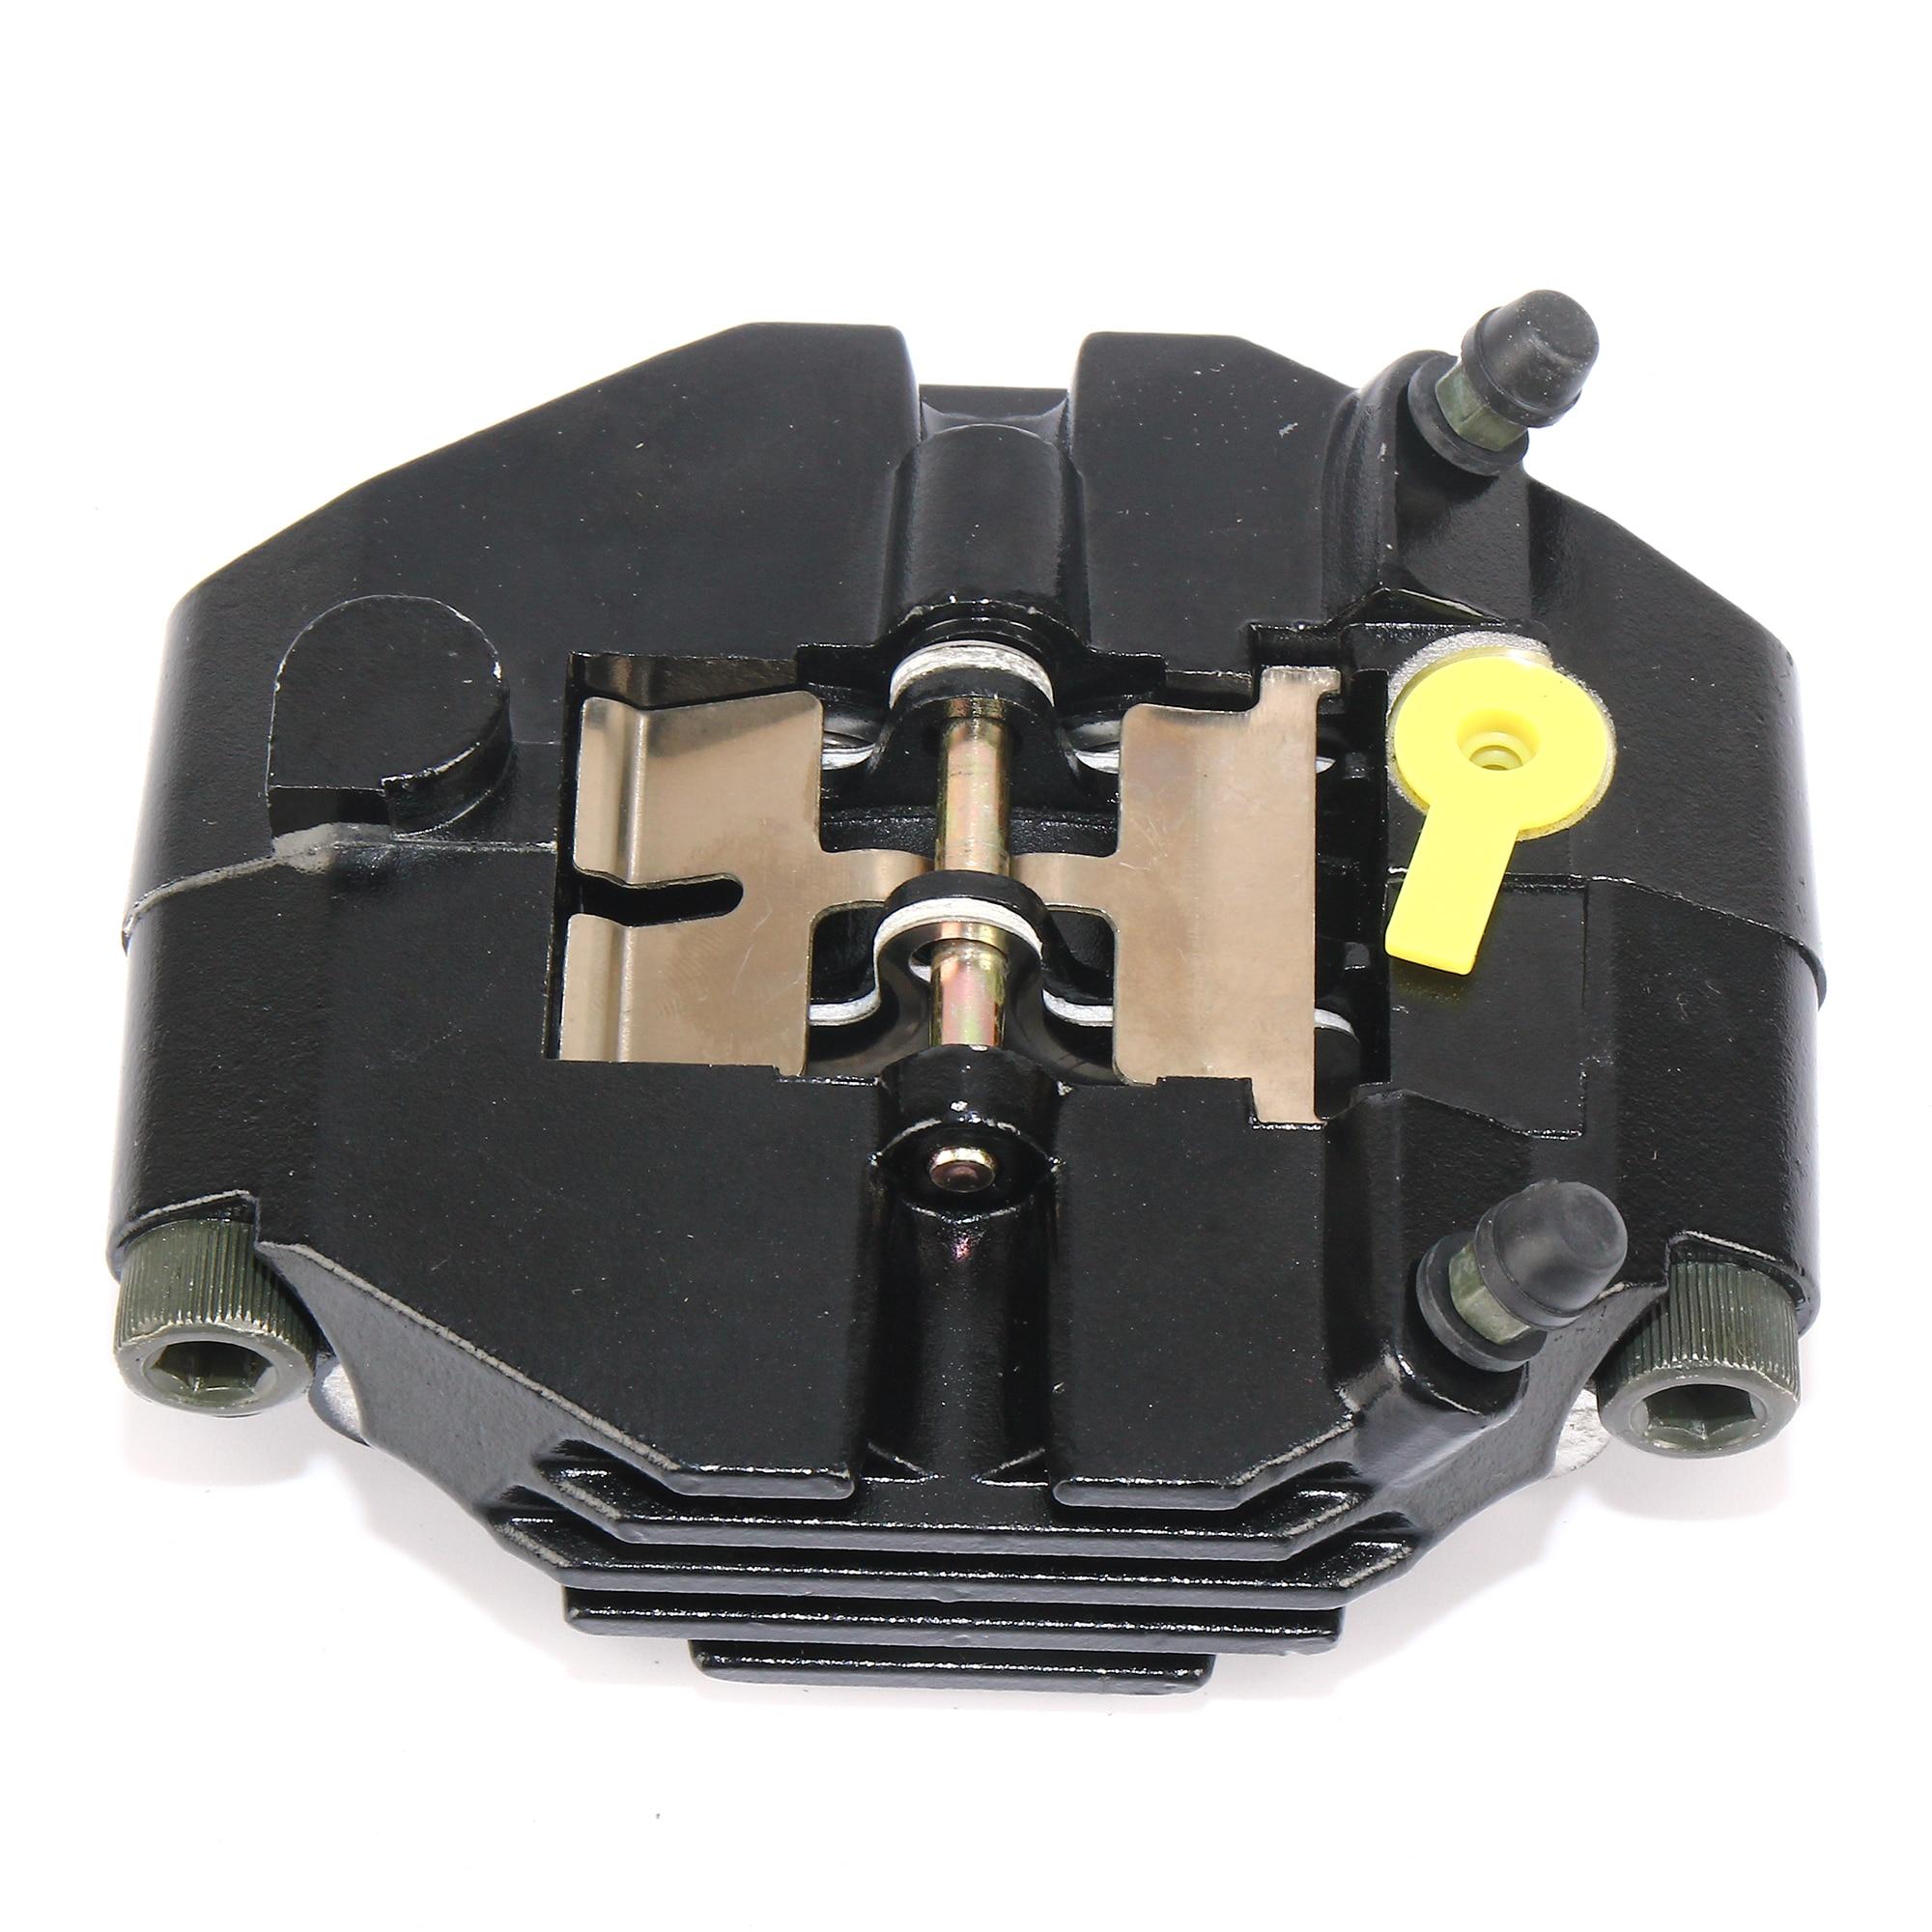 CF188 CF500 Rear Brake Caliper CF Moto Rebuild Kit 450CC UTV ATV 625 BUGGY GO KART Parts 9010-080500 HZDQ